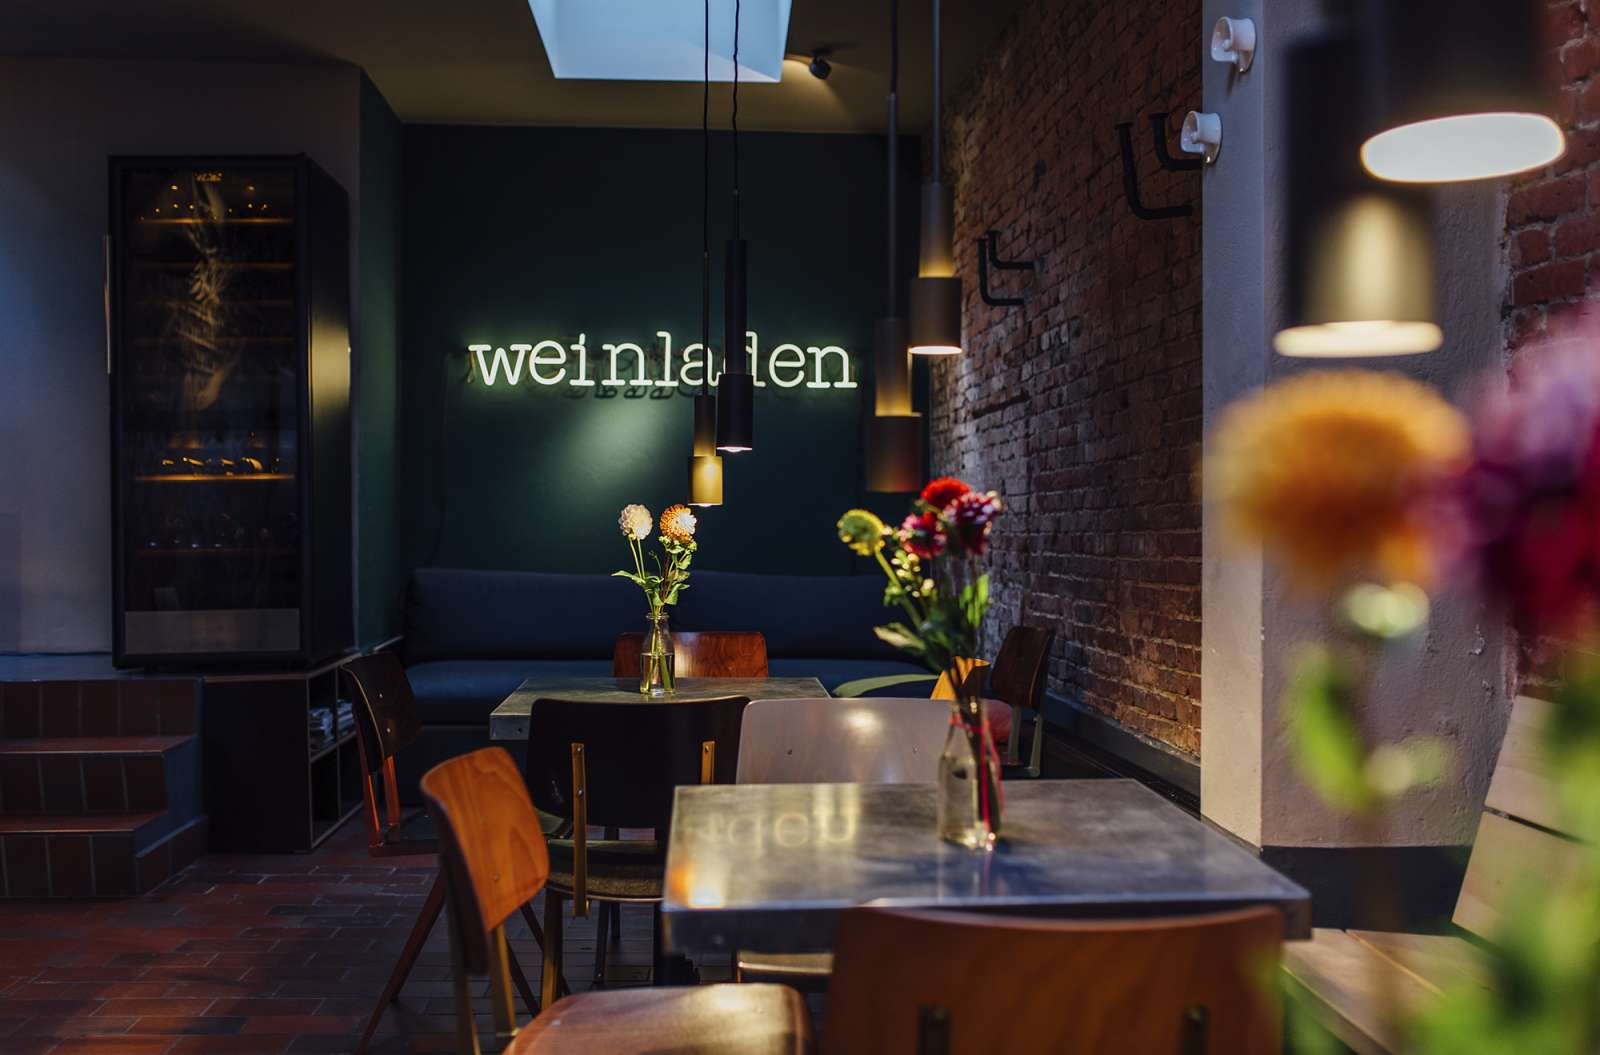 Weinladen / Foto: weinladen.de